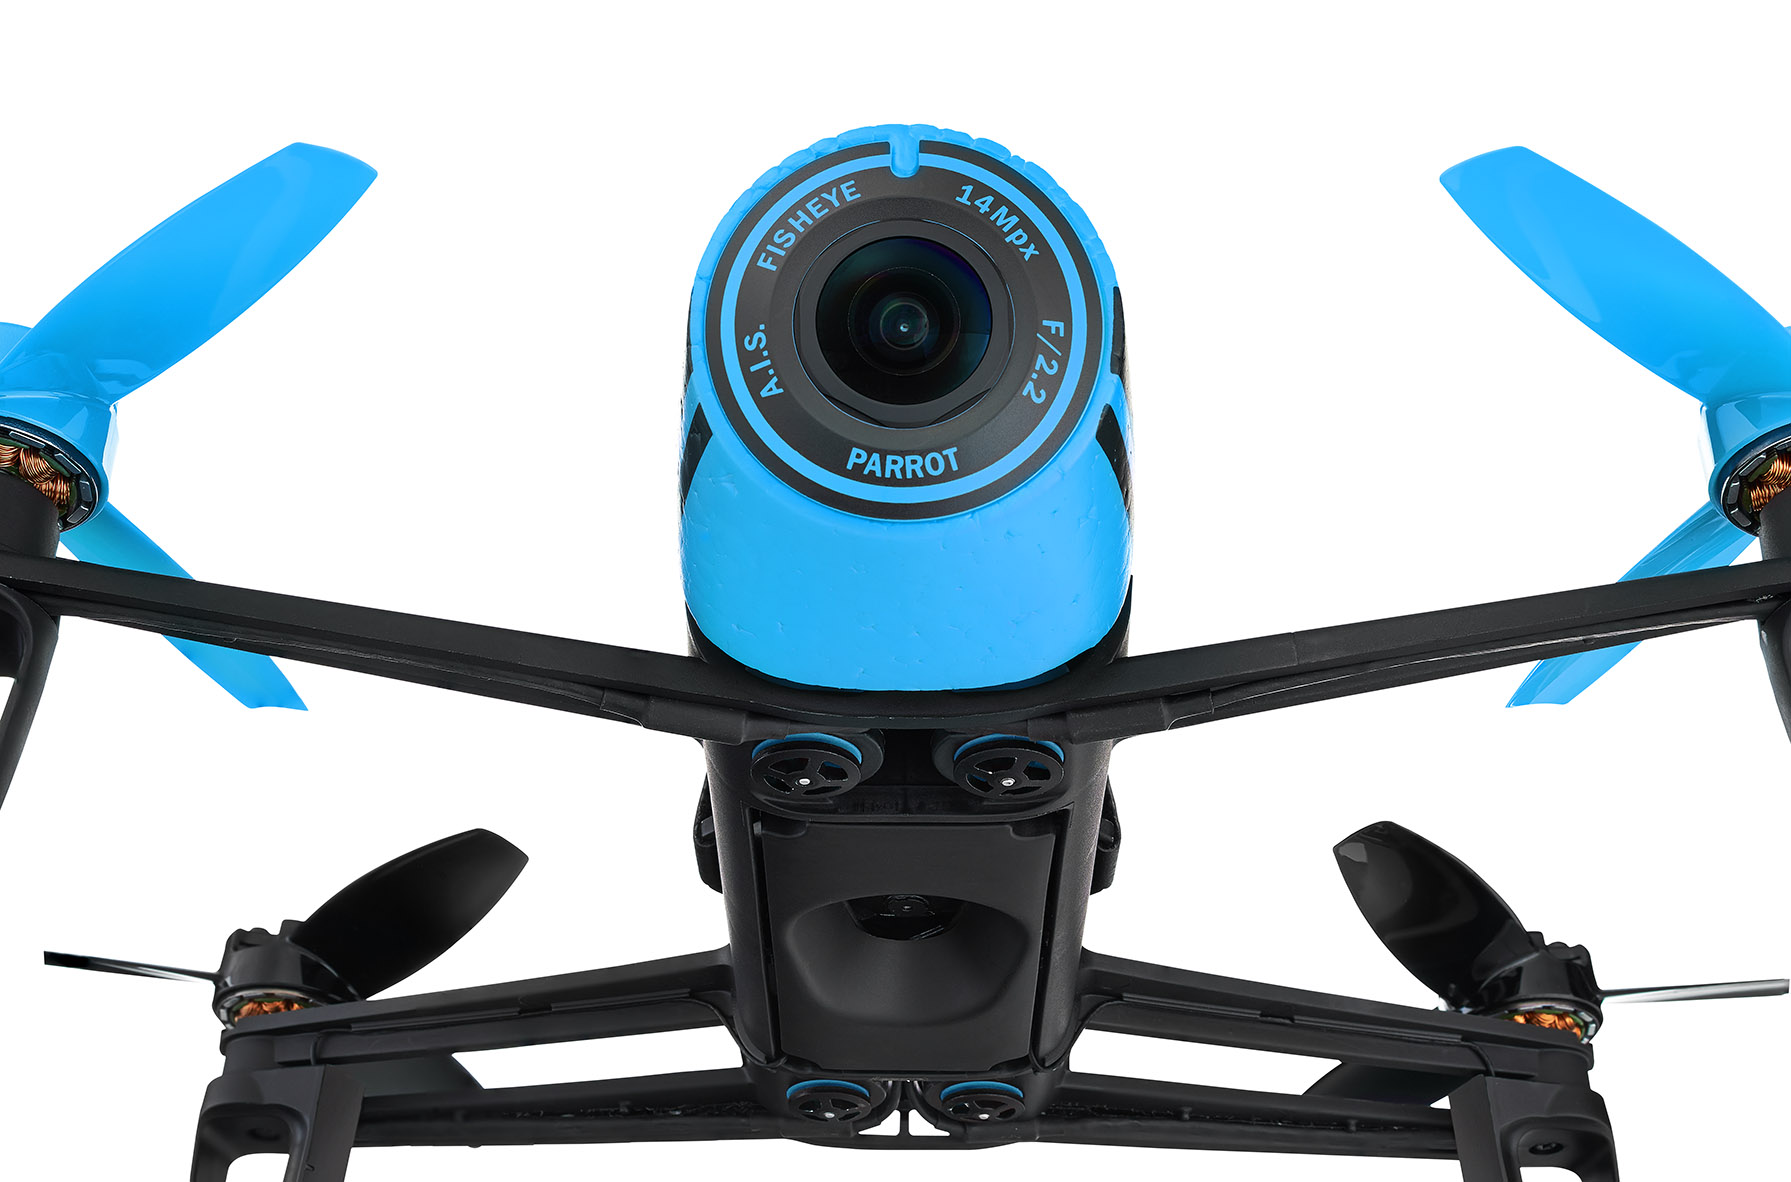 parrot-bebop-drone-new-06.jpg